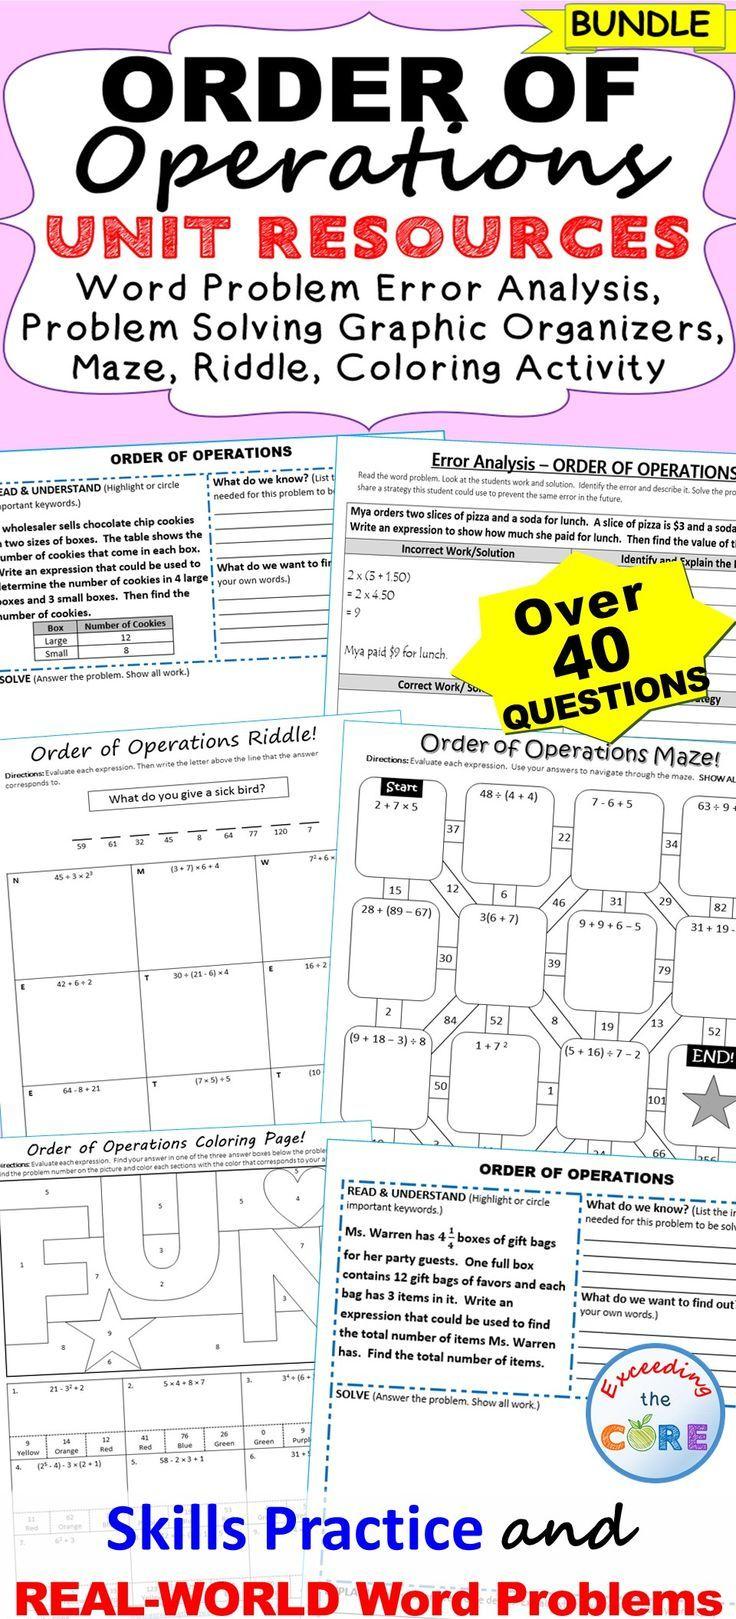 solving graphic organizers, 1 maze worksheet, 1 riddle worksheet ...